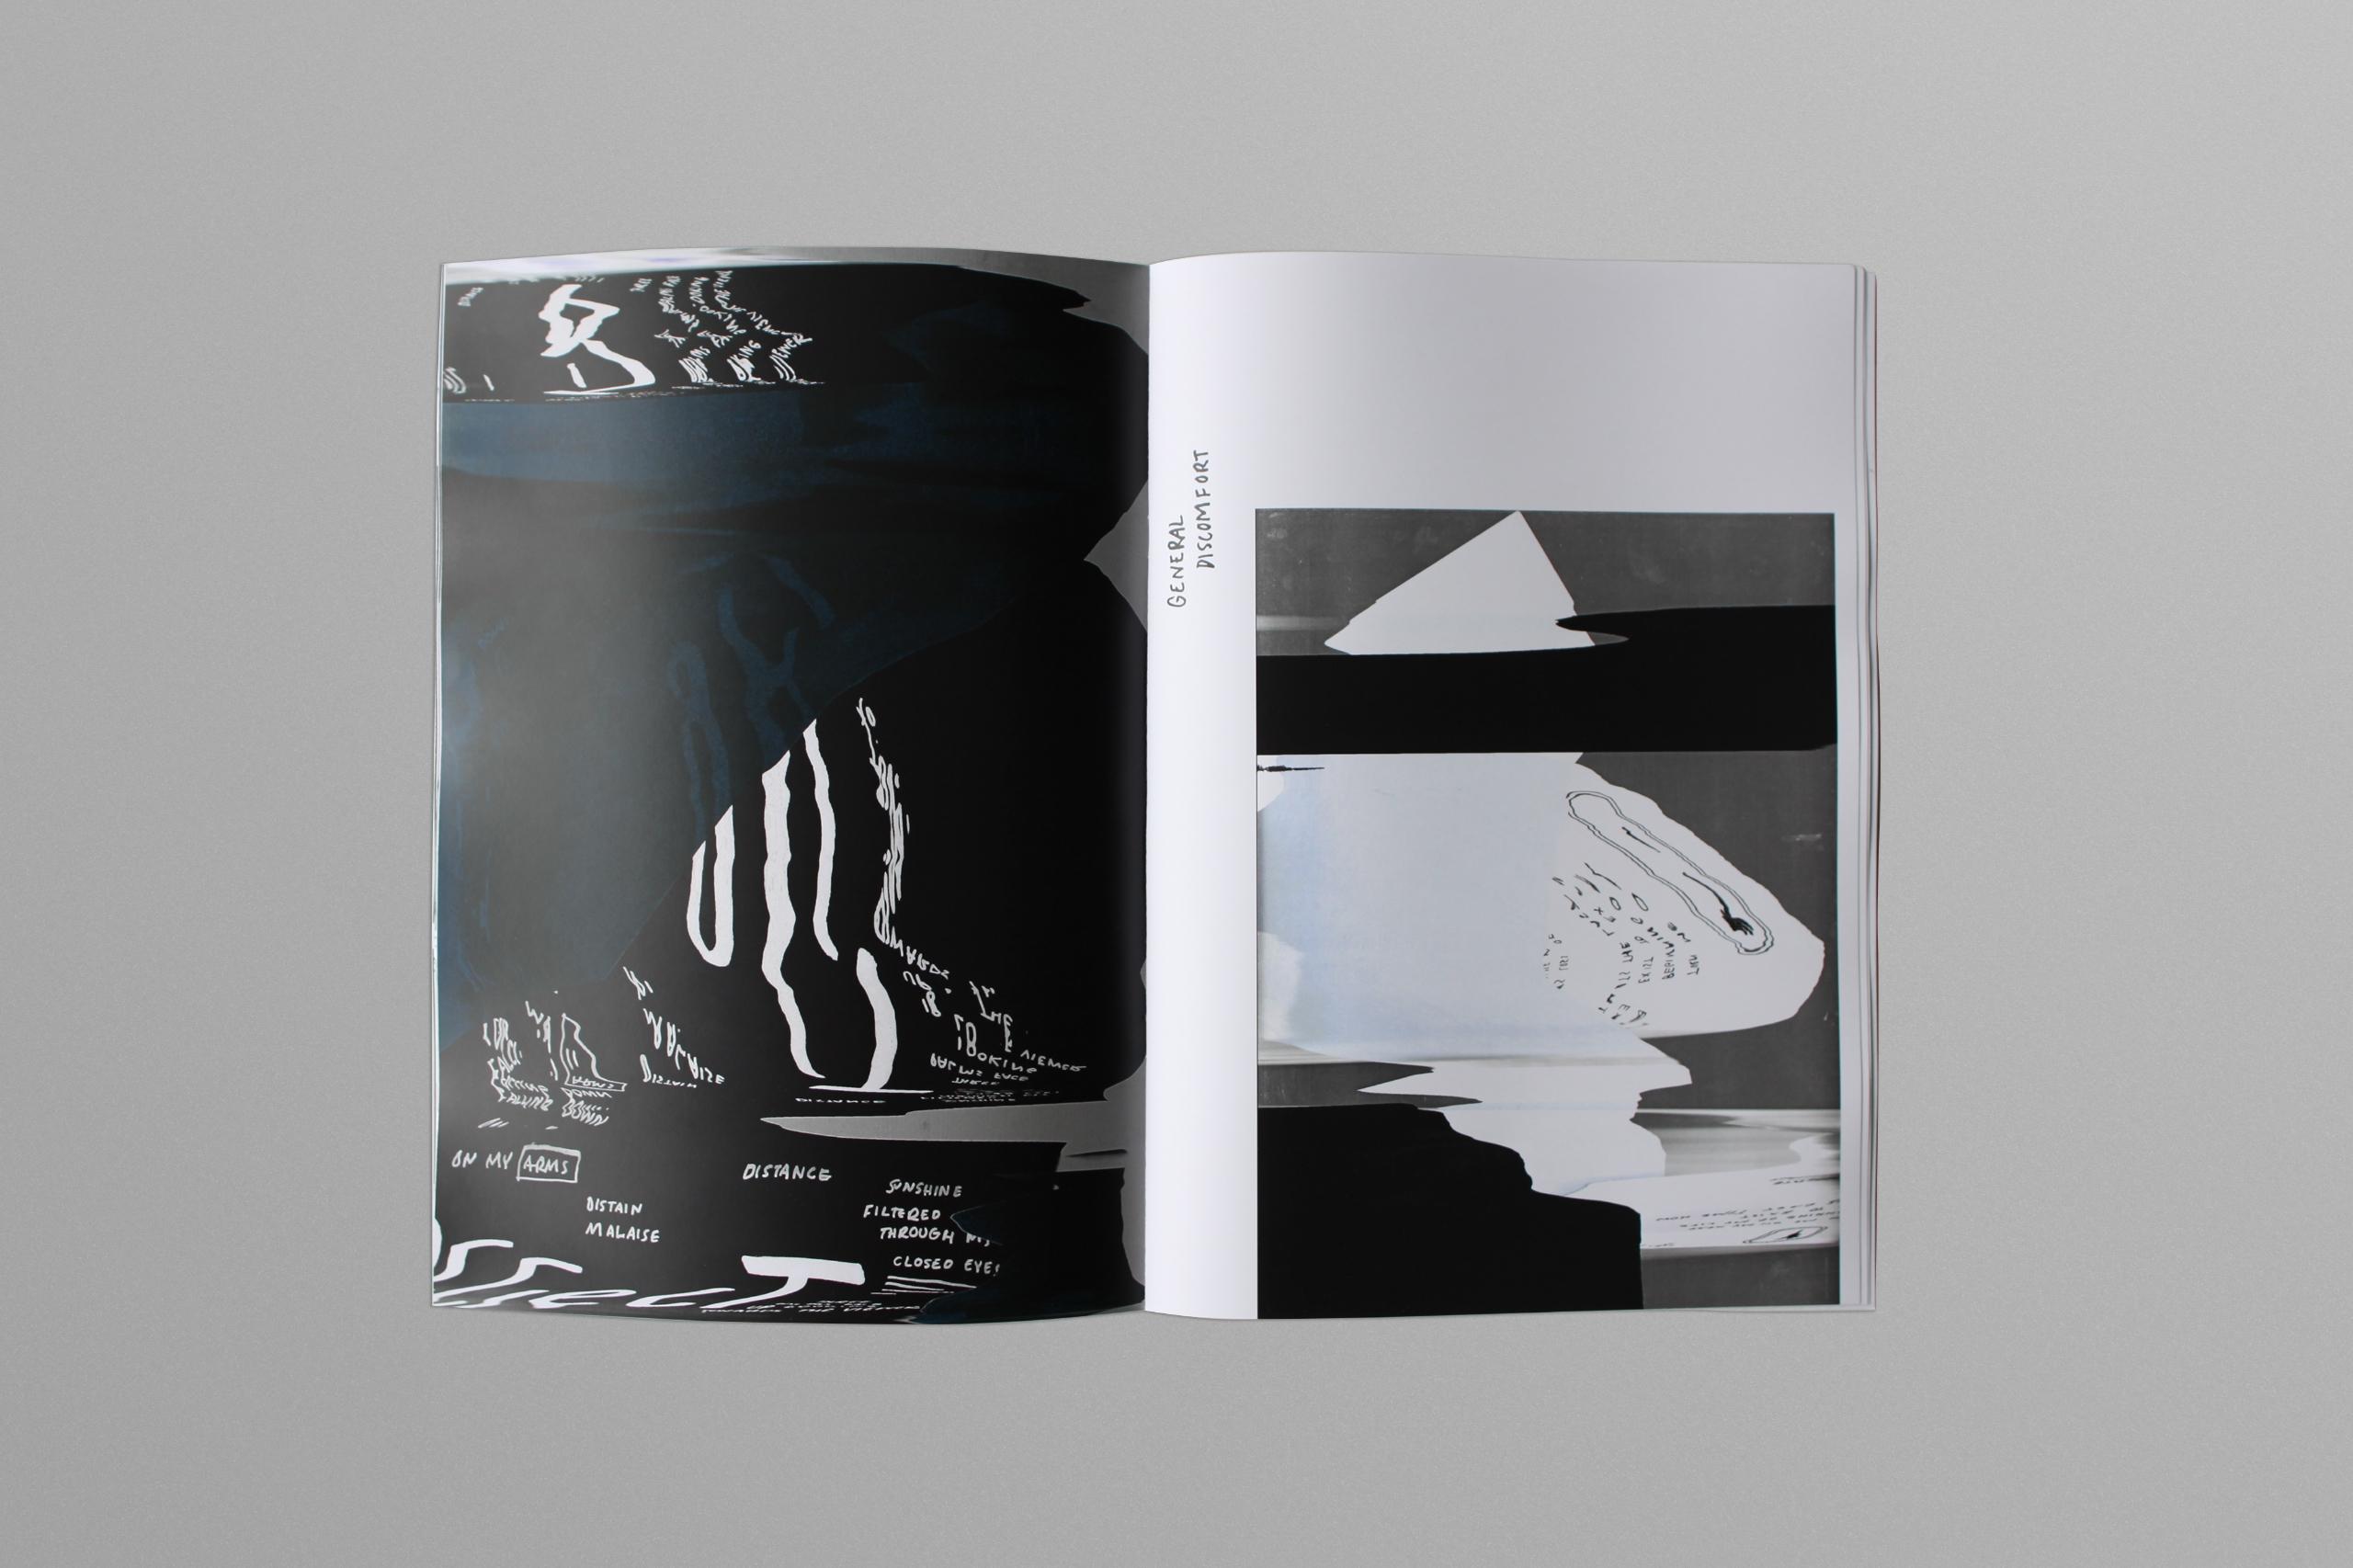 Malaise graphicdesign shortstor - danielflynn | ello